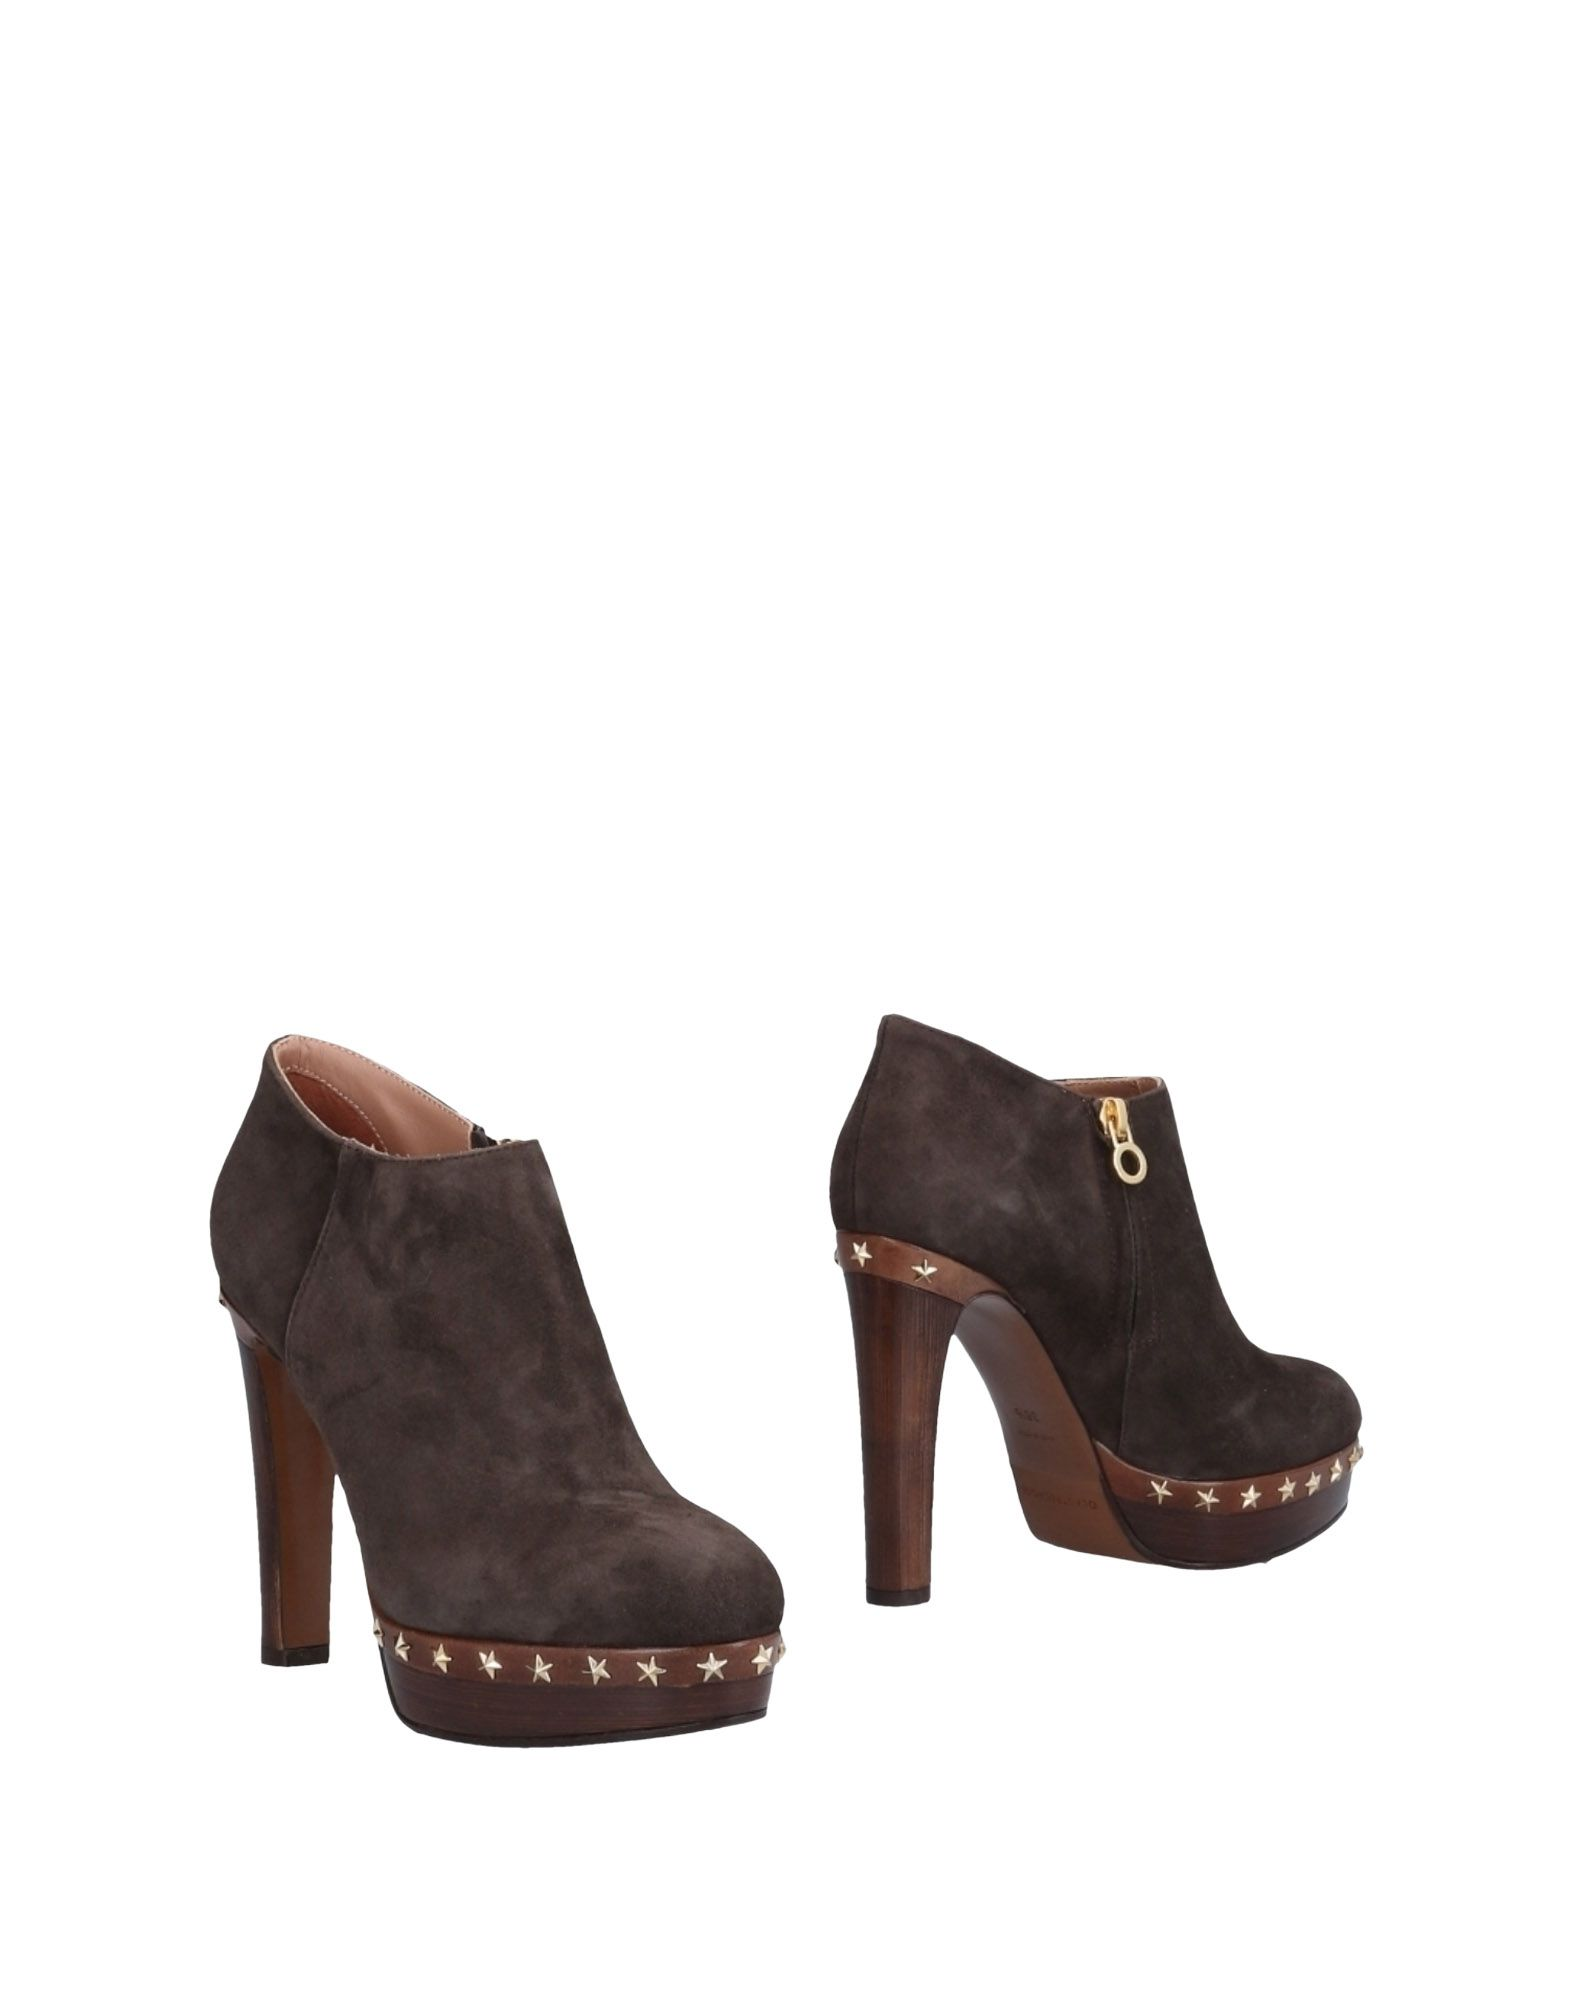 L' Autre Chose Stiefelette Damen  11488159AM Neue Neue 11488159AM Schuhe 205444